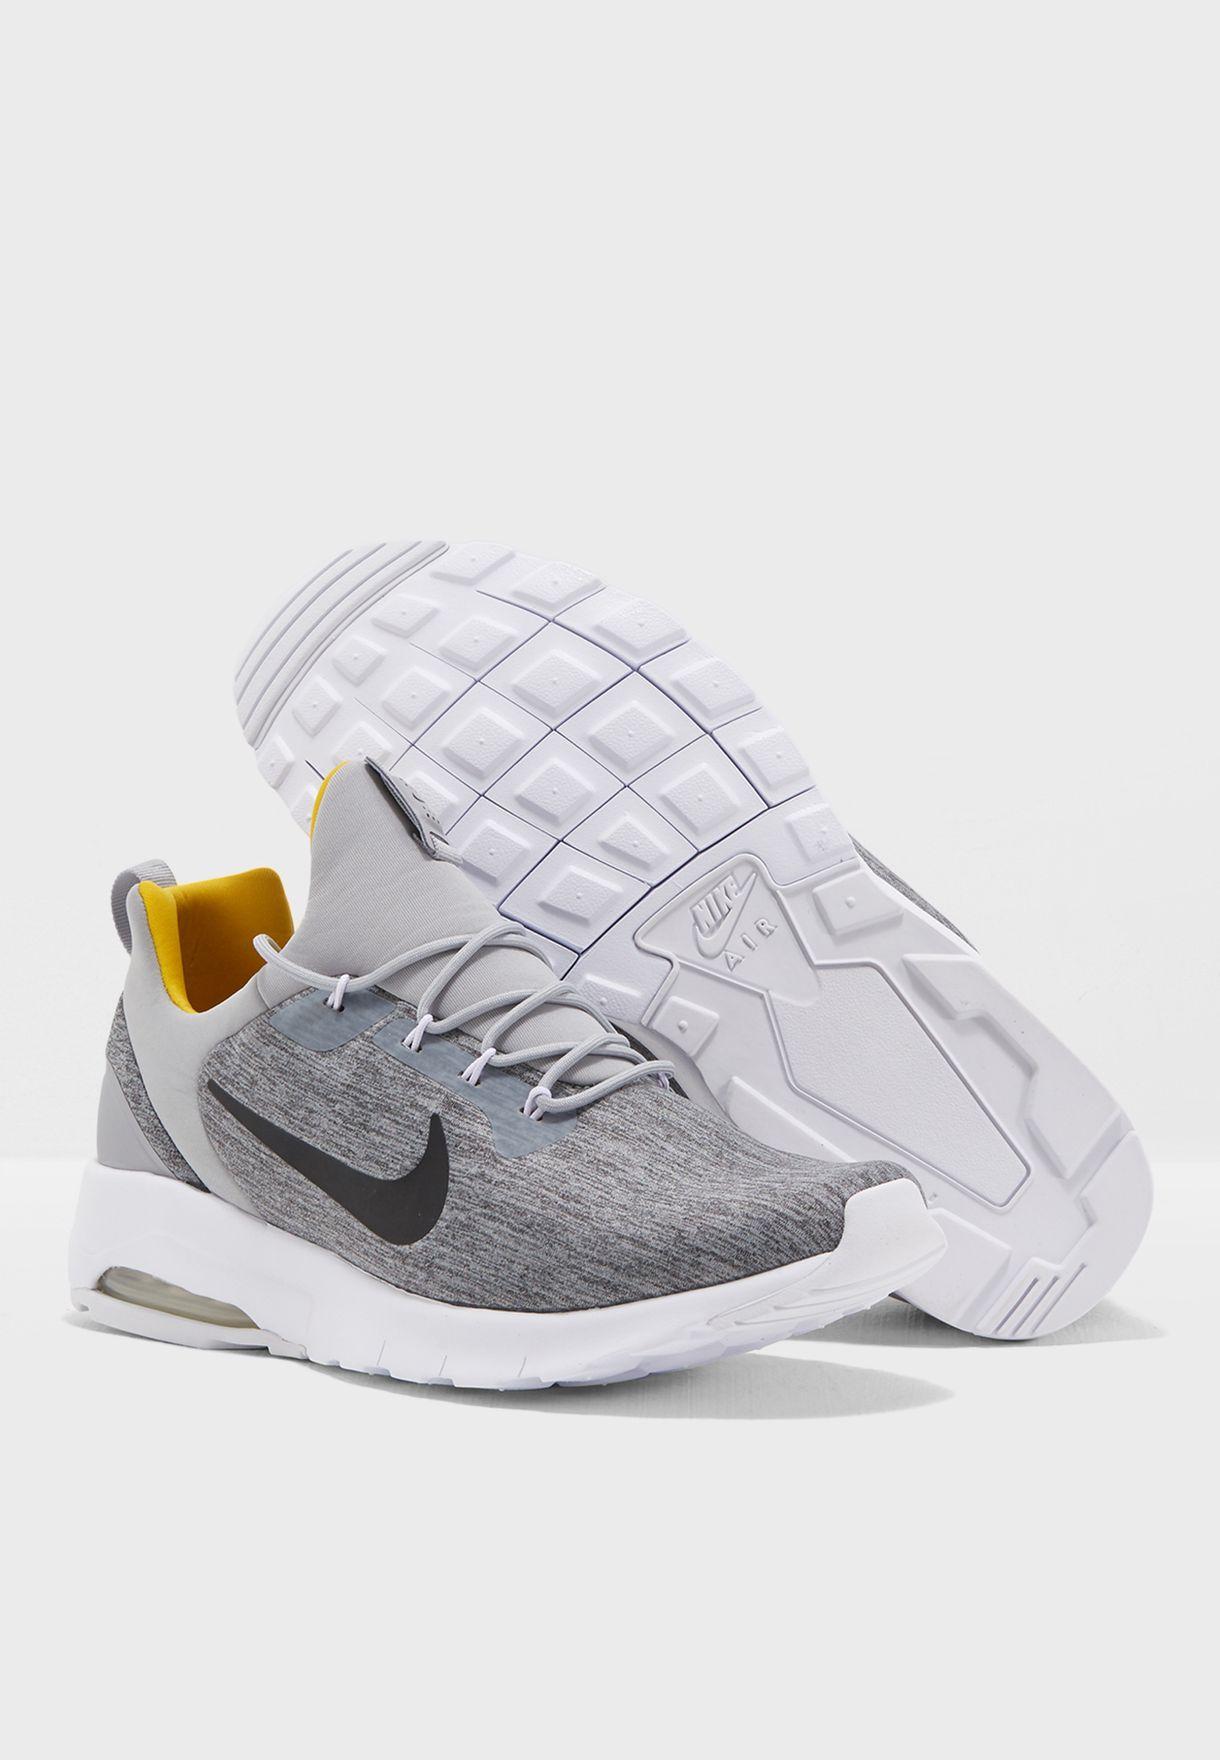 052f10871d38 Shop Nike grey Air Max Motion Racer 916771-005 for Men in Saudi ...